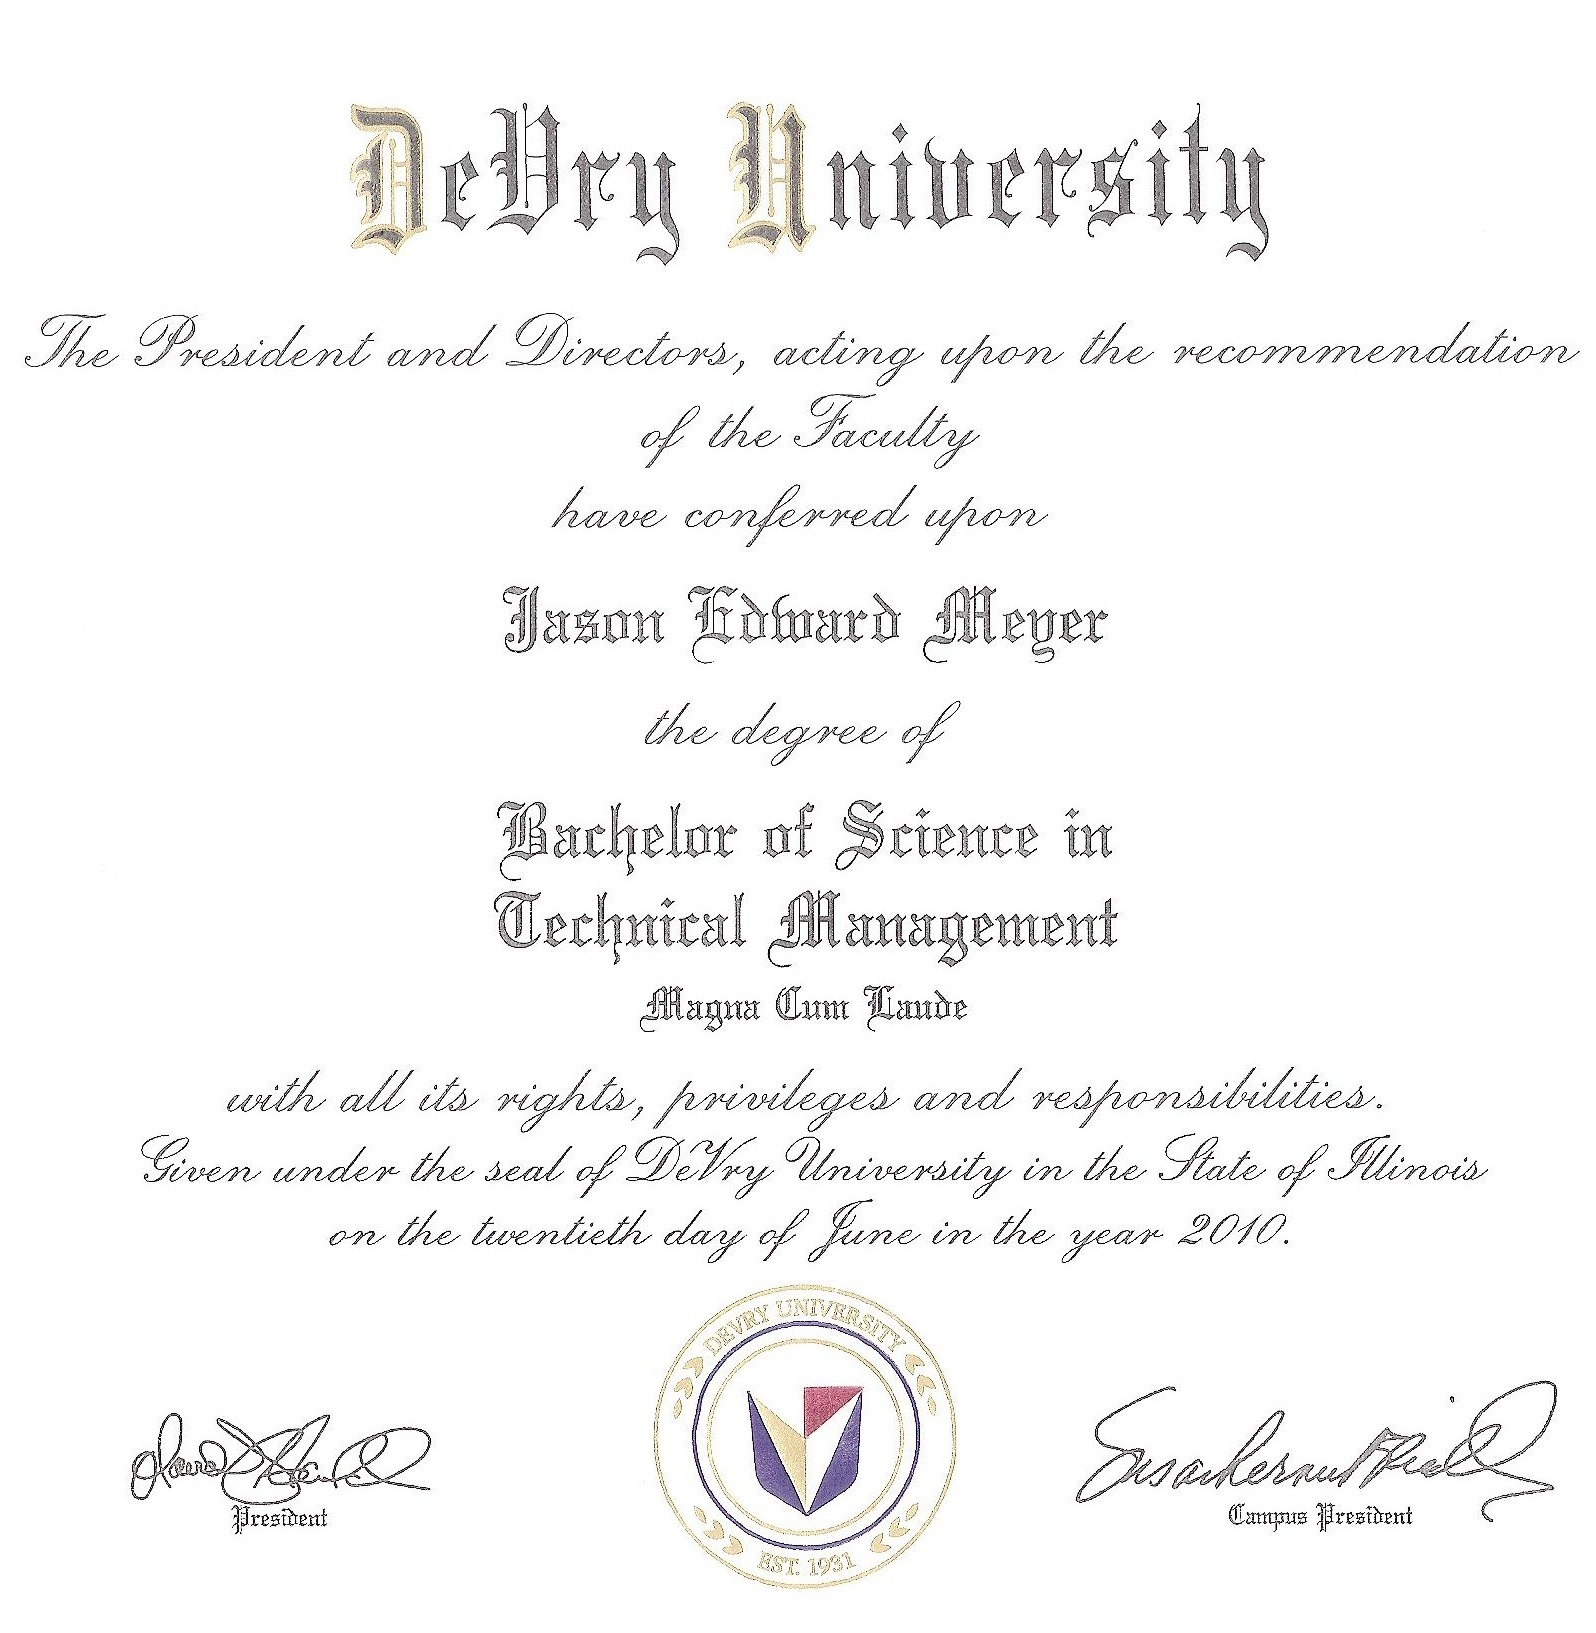 Jason Meyer's Bachelors Degree